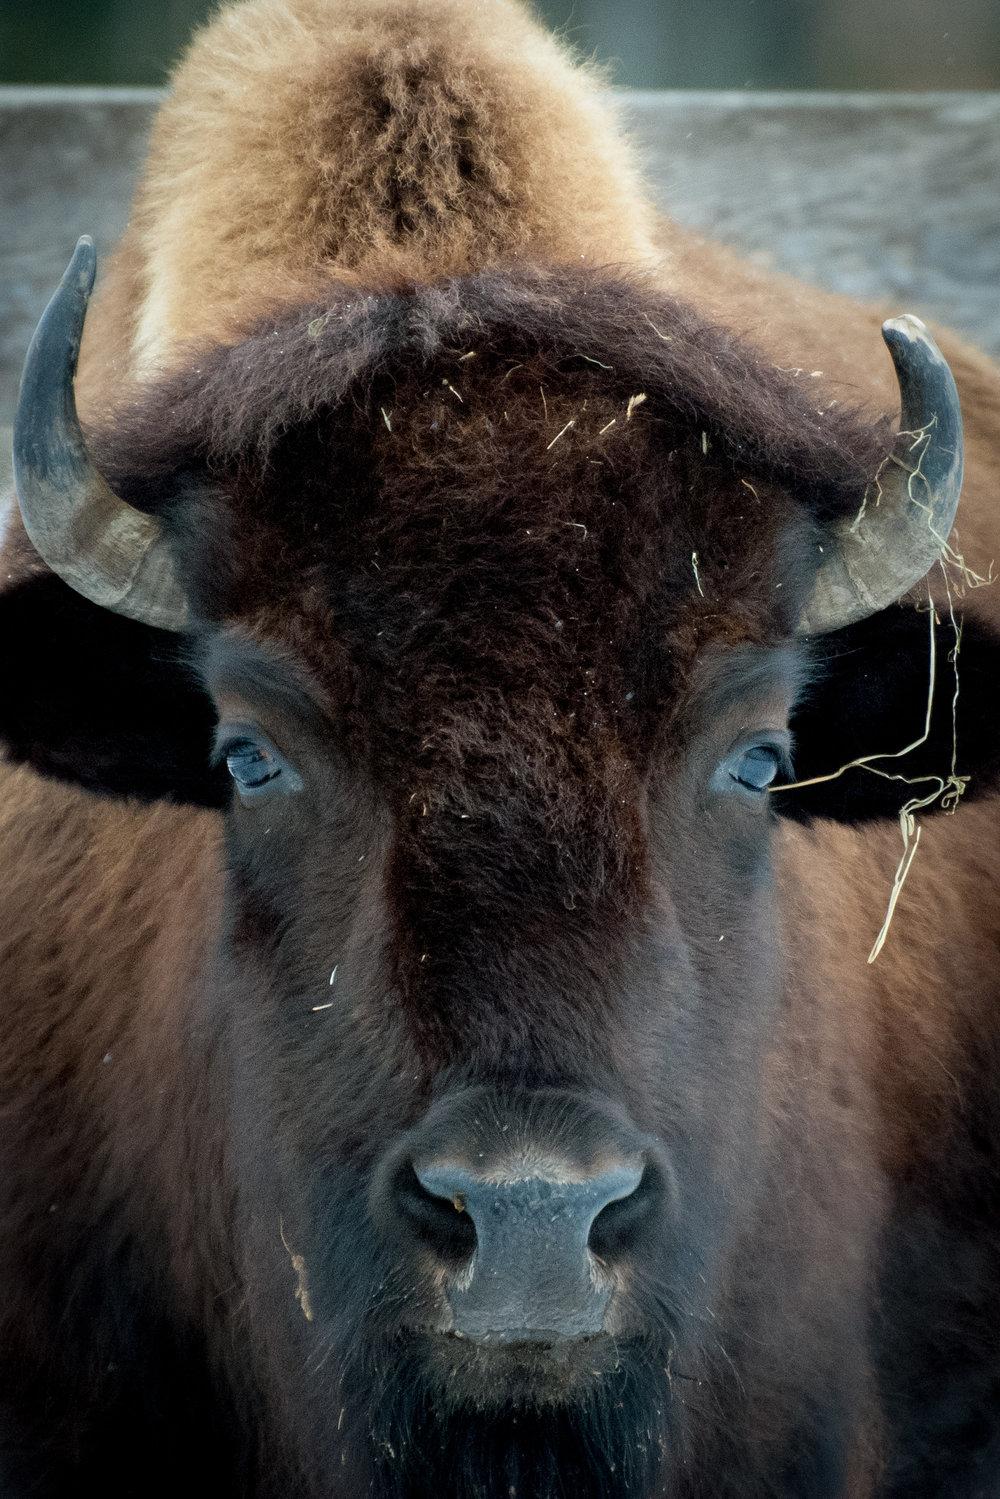 buffalo_1(c) catherine frost.jpg